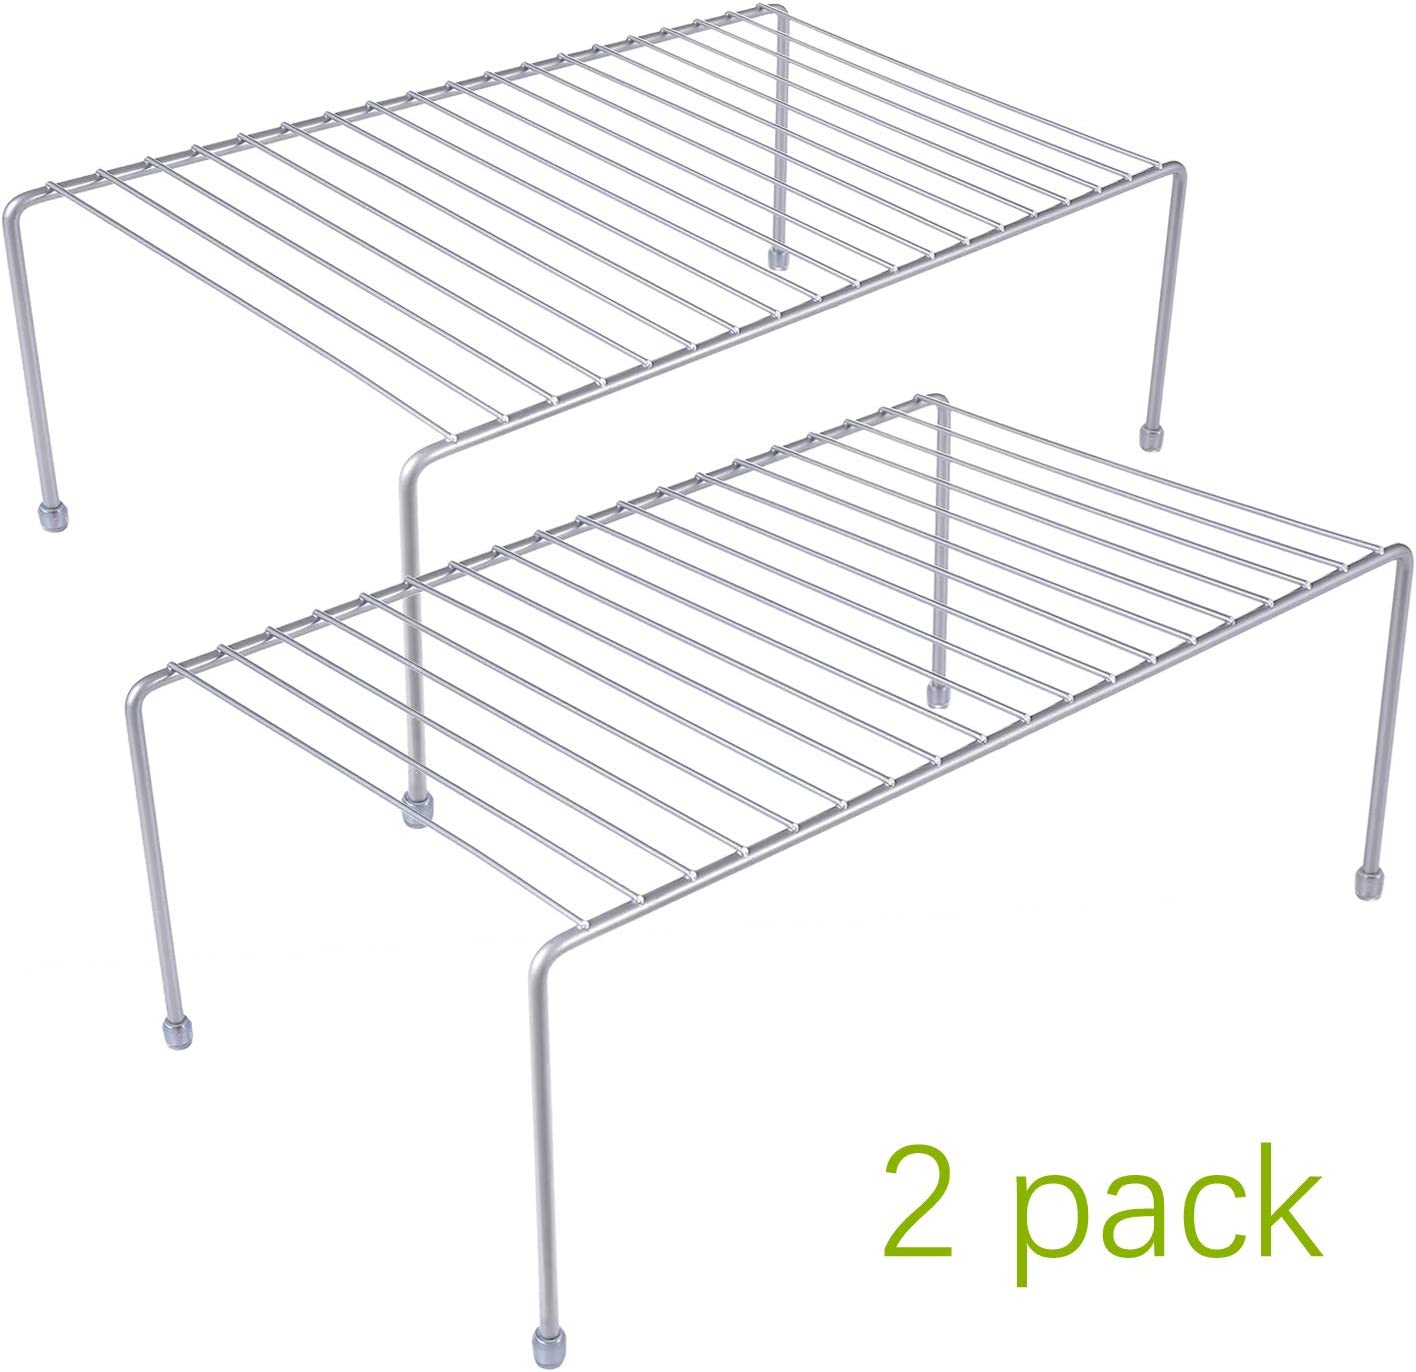 yaenoei Kitchen Storage Shelf Rack w/Plastic Feet - Medium - Steel Metal - Rust Resistant Finish - Cups, Dishes, Cabinet & Pantry Organization - Kitchen [Silver] 2 Pack